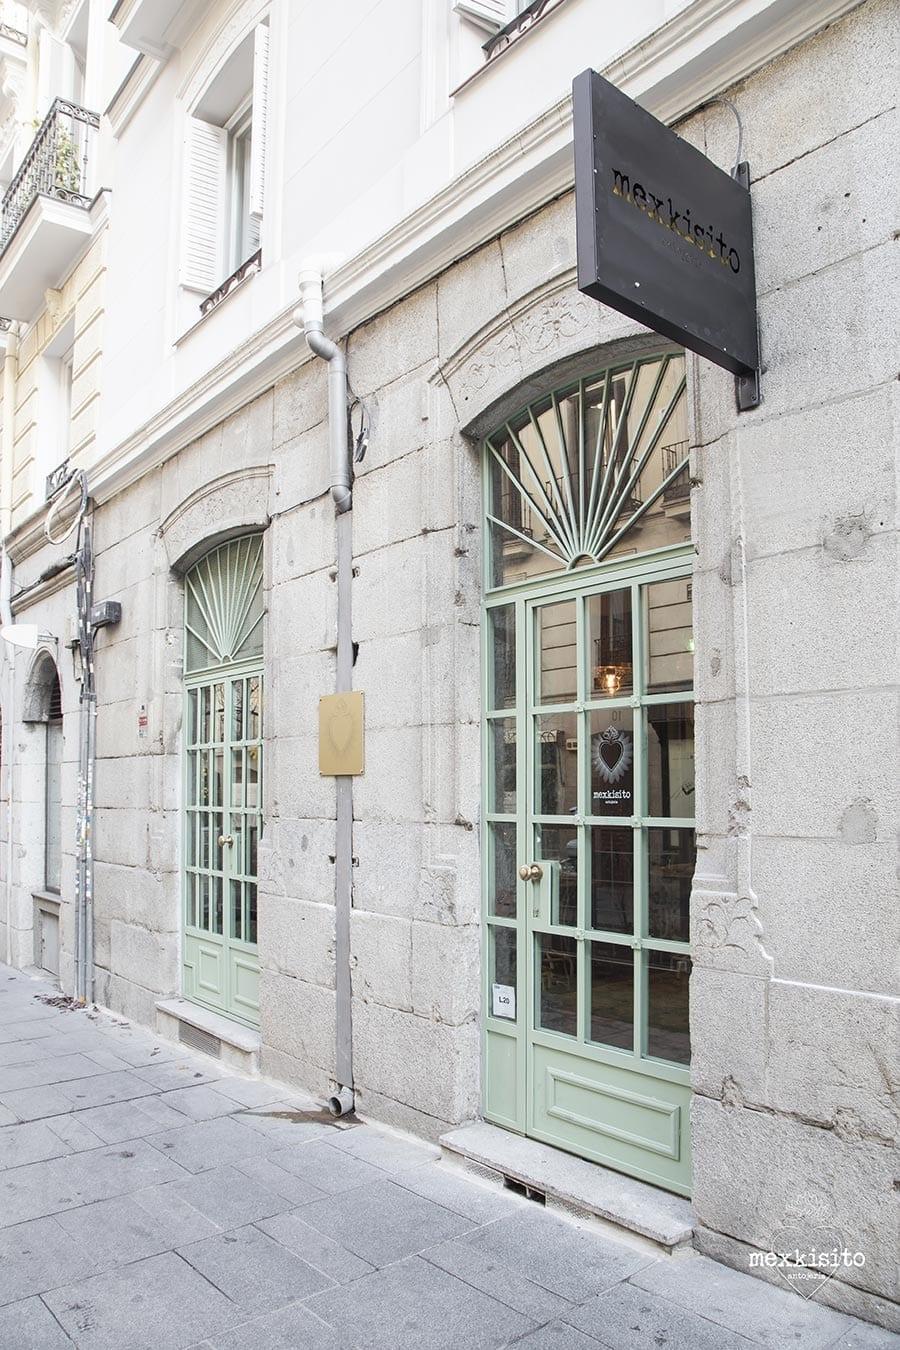 mexkisito décoration restaurants-industriel-(12)